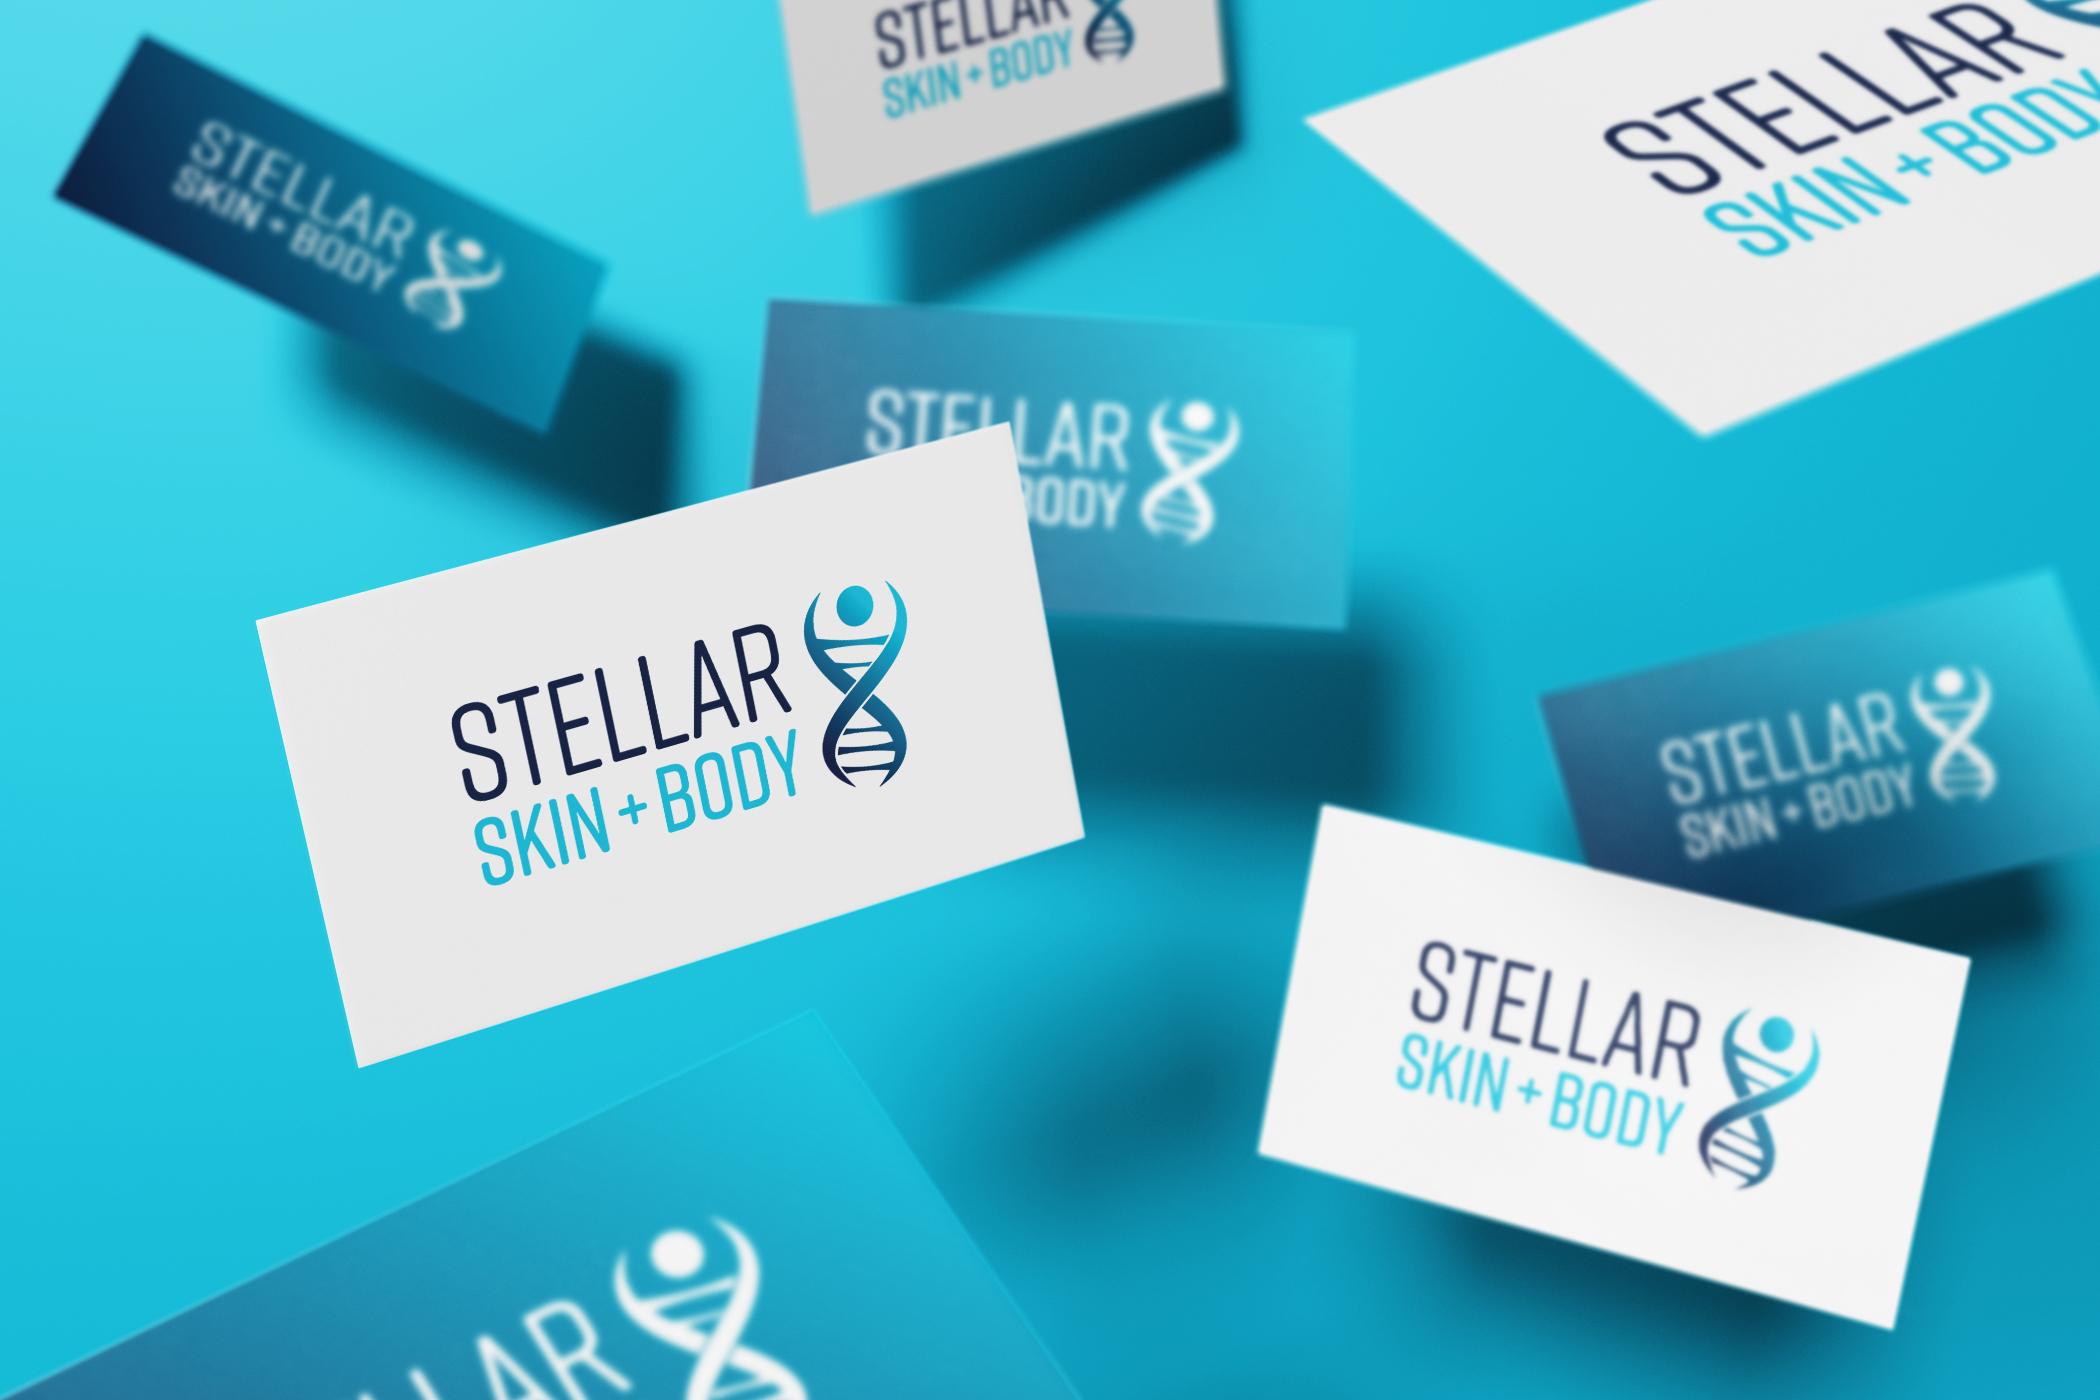 Stellar Skin + Body